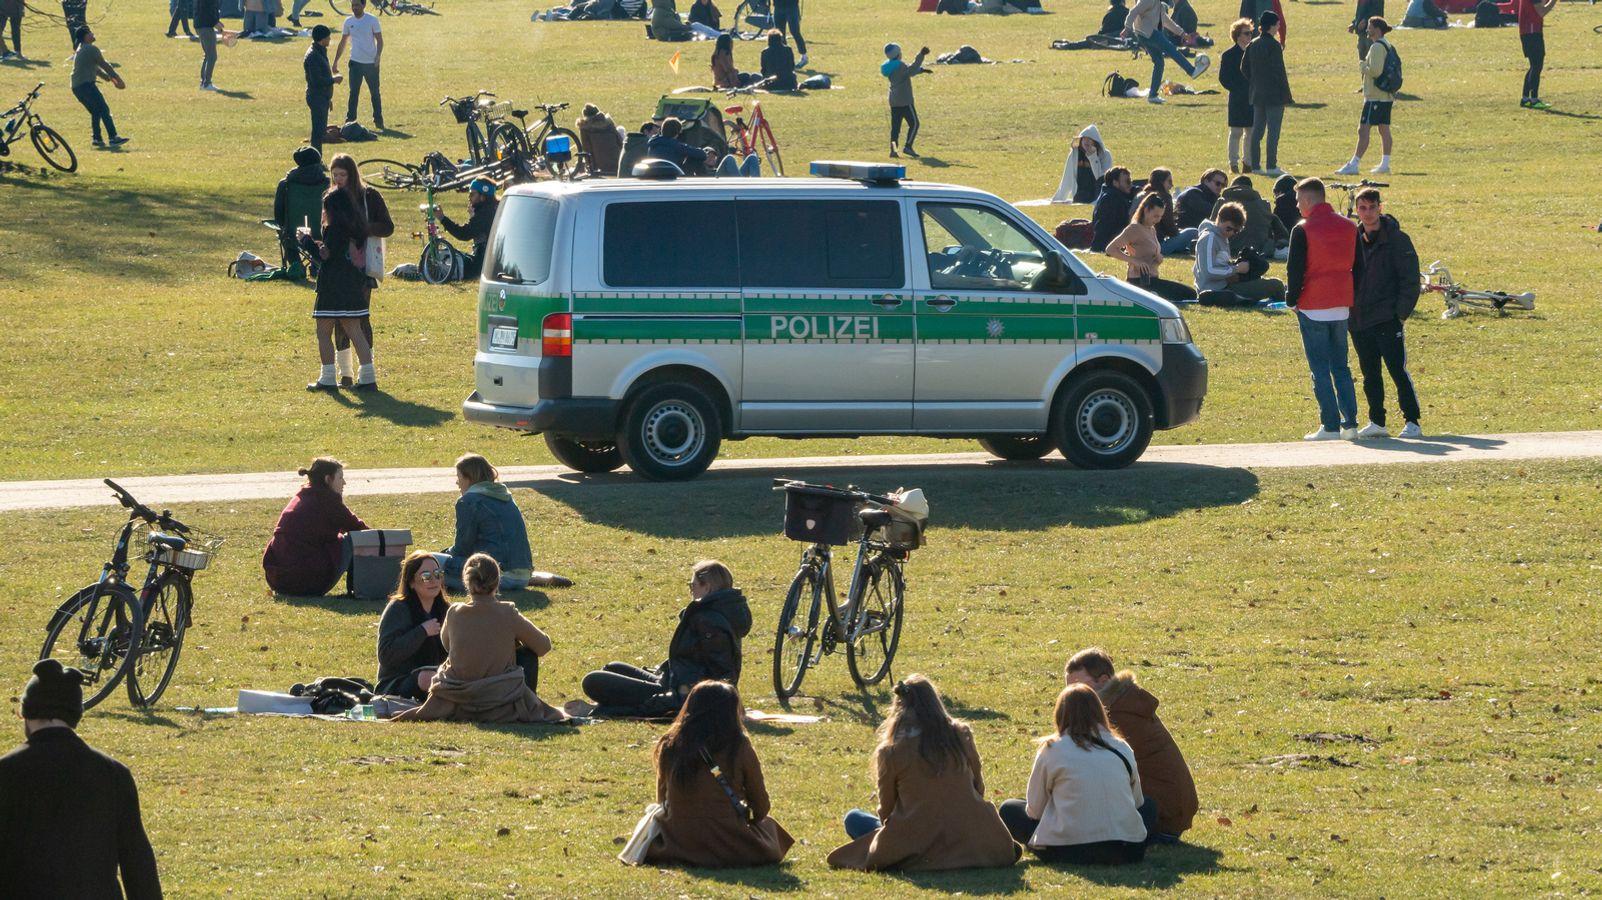 Fallzahlen steigen: Die aktuelle Corona-Lage in Bayern - BR24